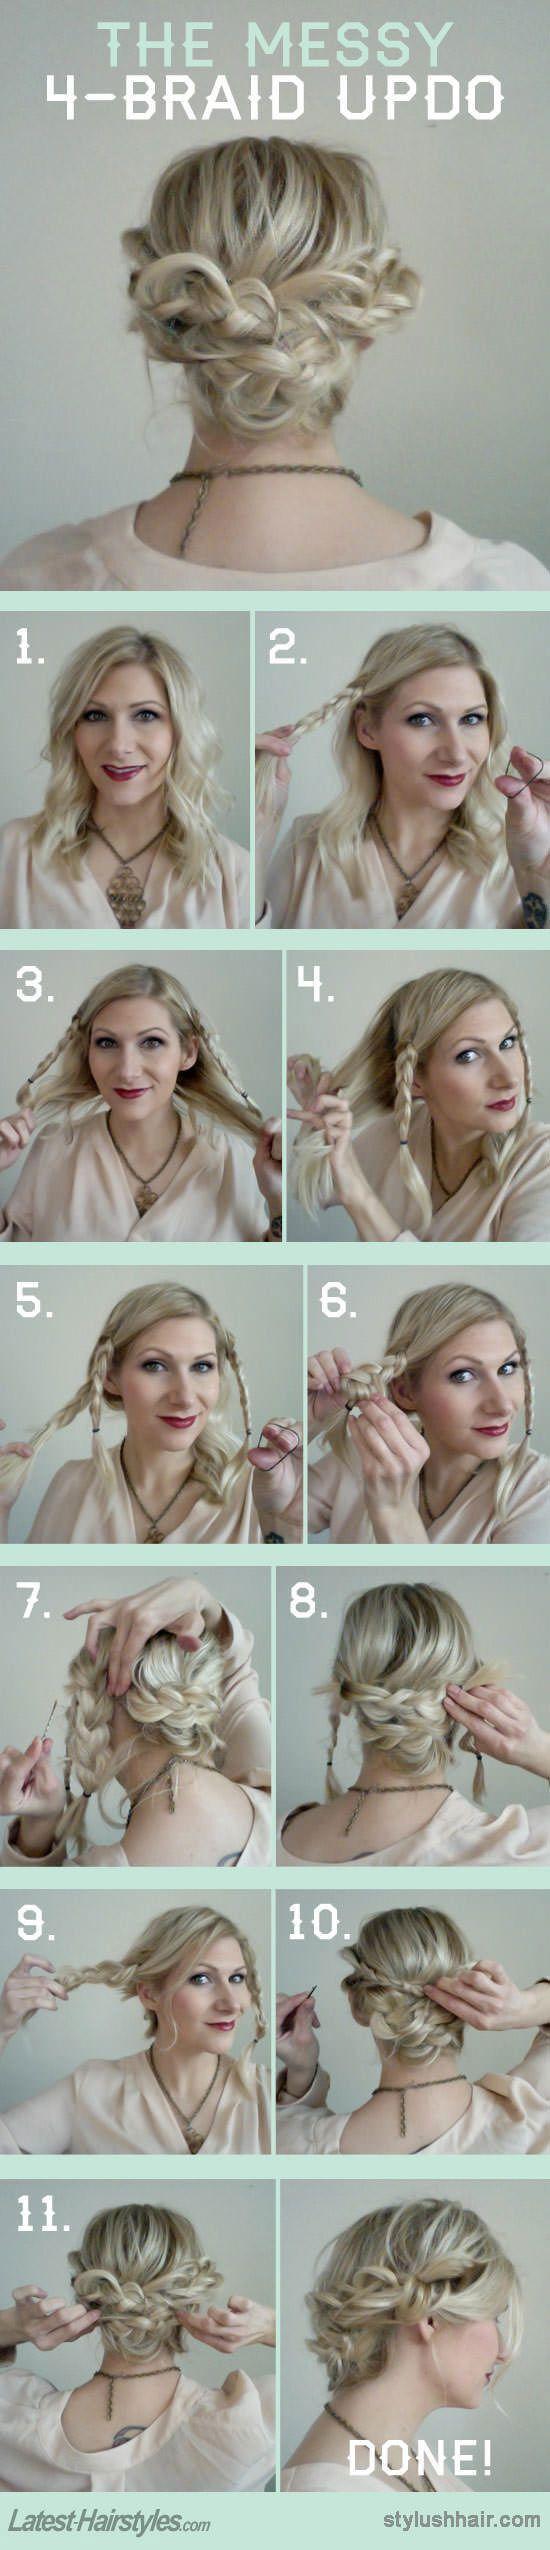 16 easy and chic bun hairstyles for medium hair - pretty designs